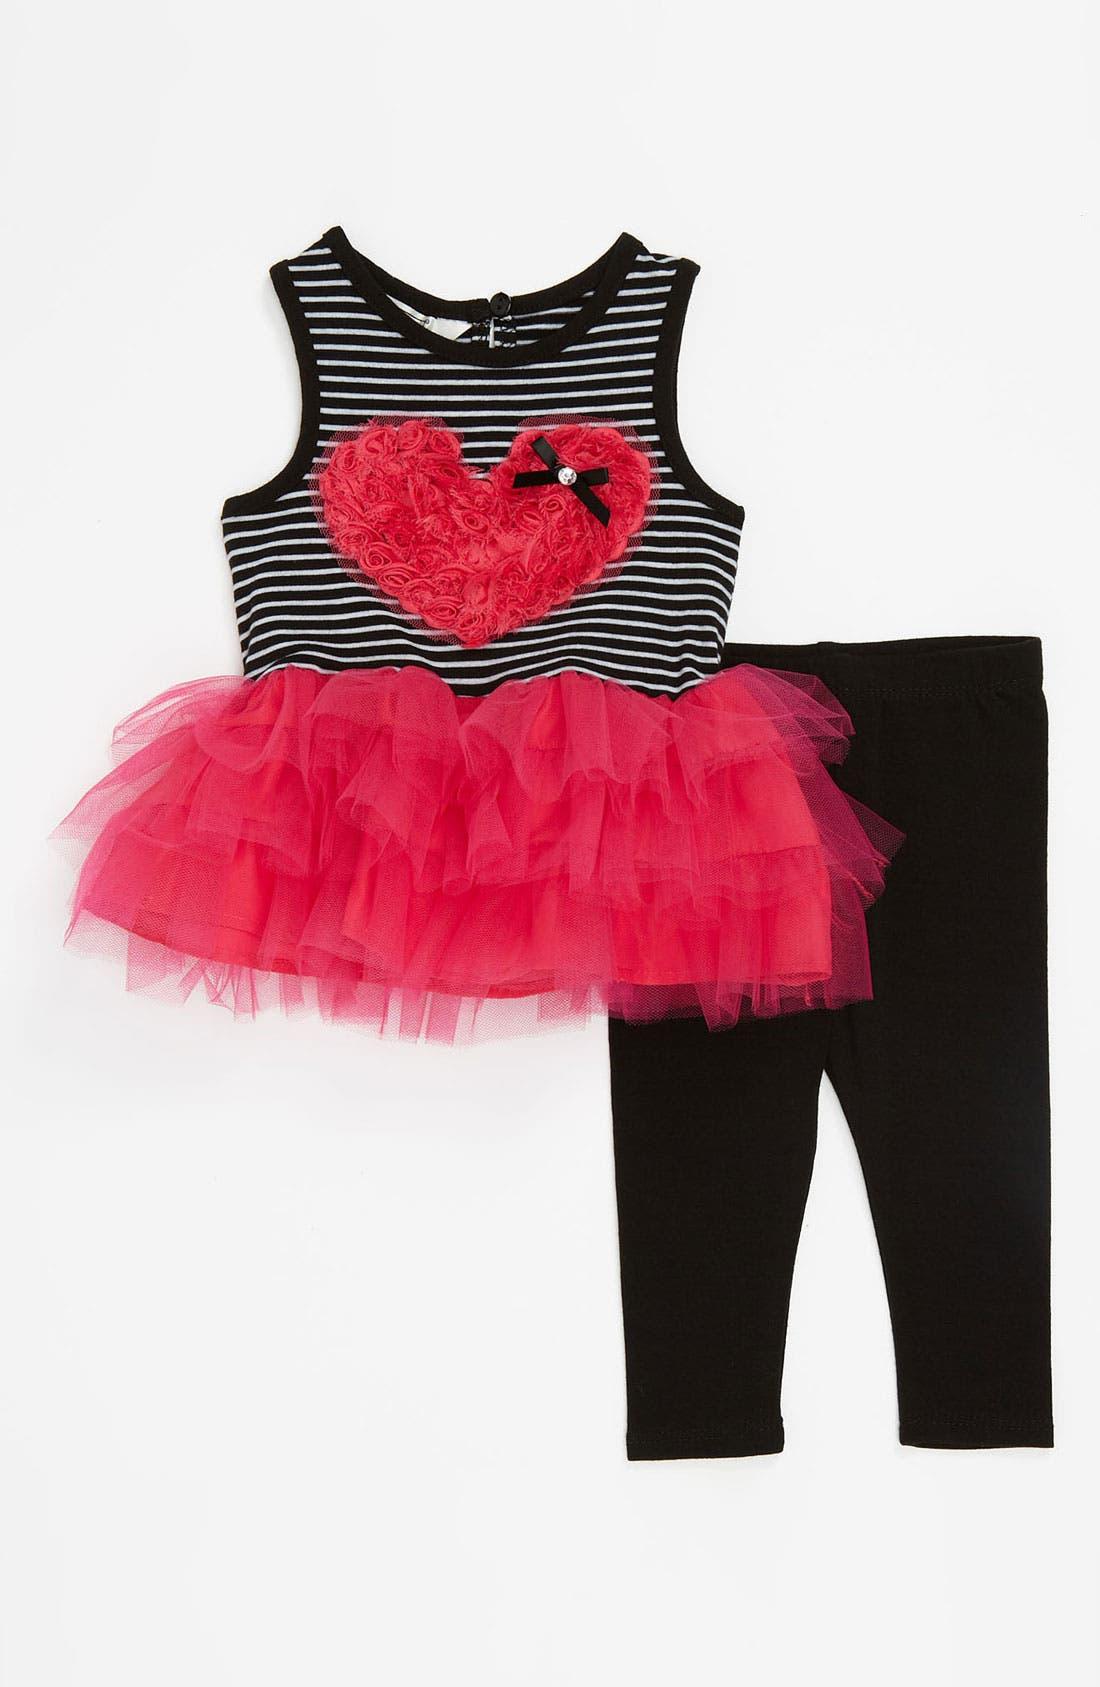 Alternate Image 1 Selected - Pippa & Julie Soutache Heart Top & Leggings (Infant)